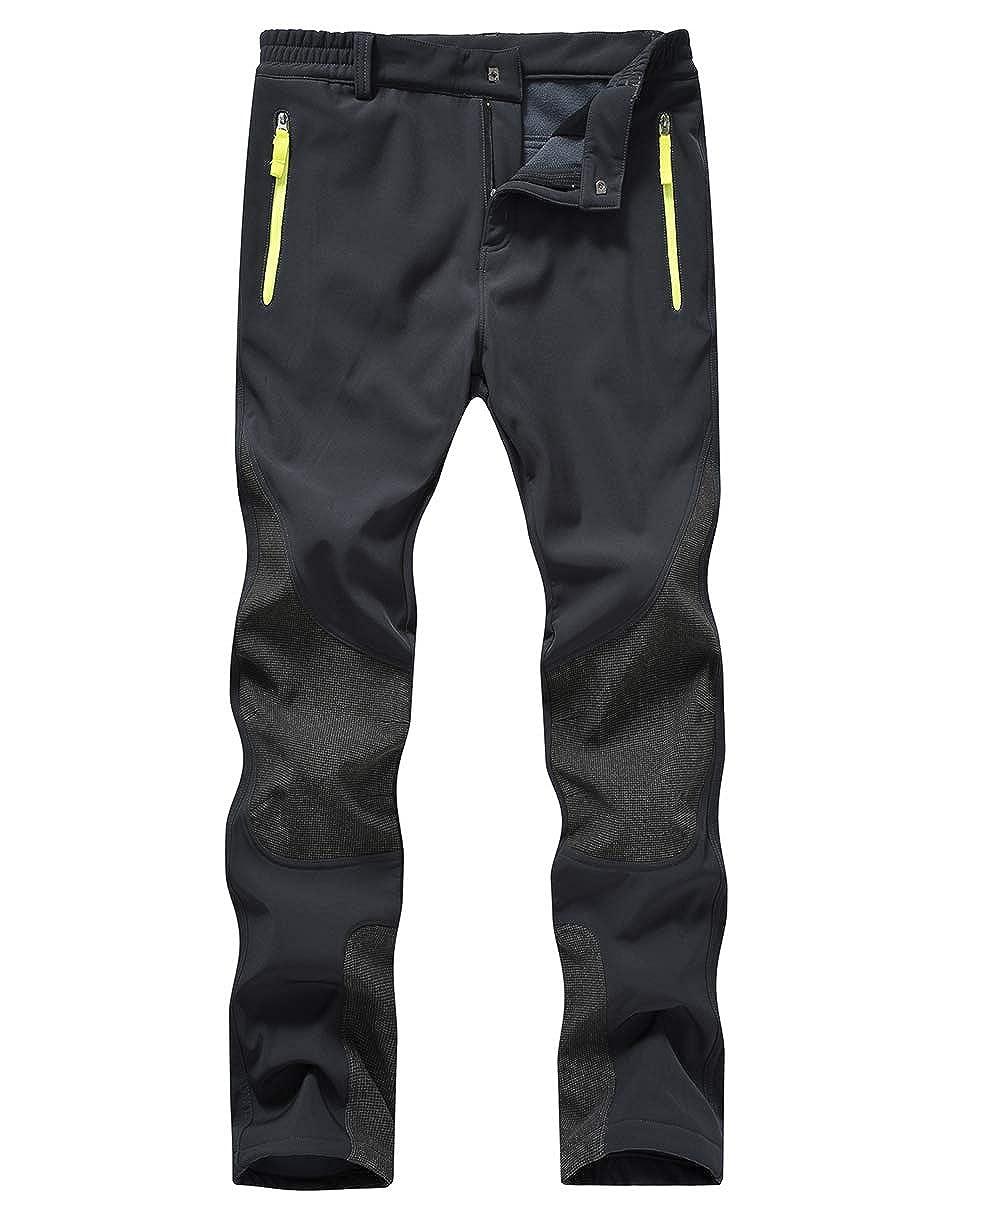 YSENTO Skiing Pants for Women Waterproof Quick Dry Fleece Insulated Pants Zipper Pockets